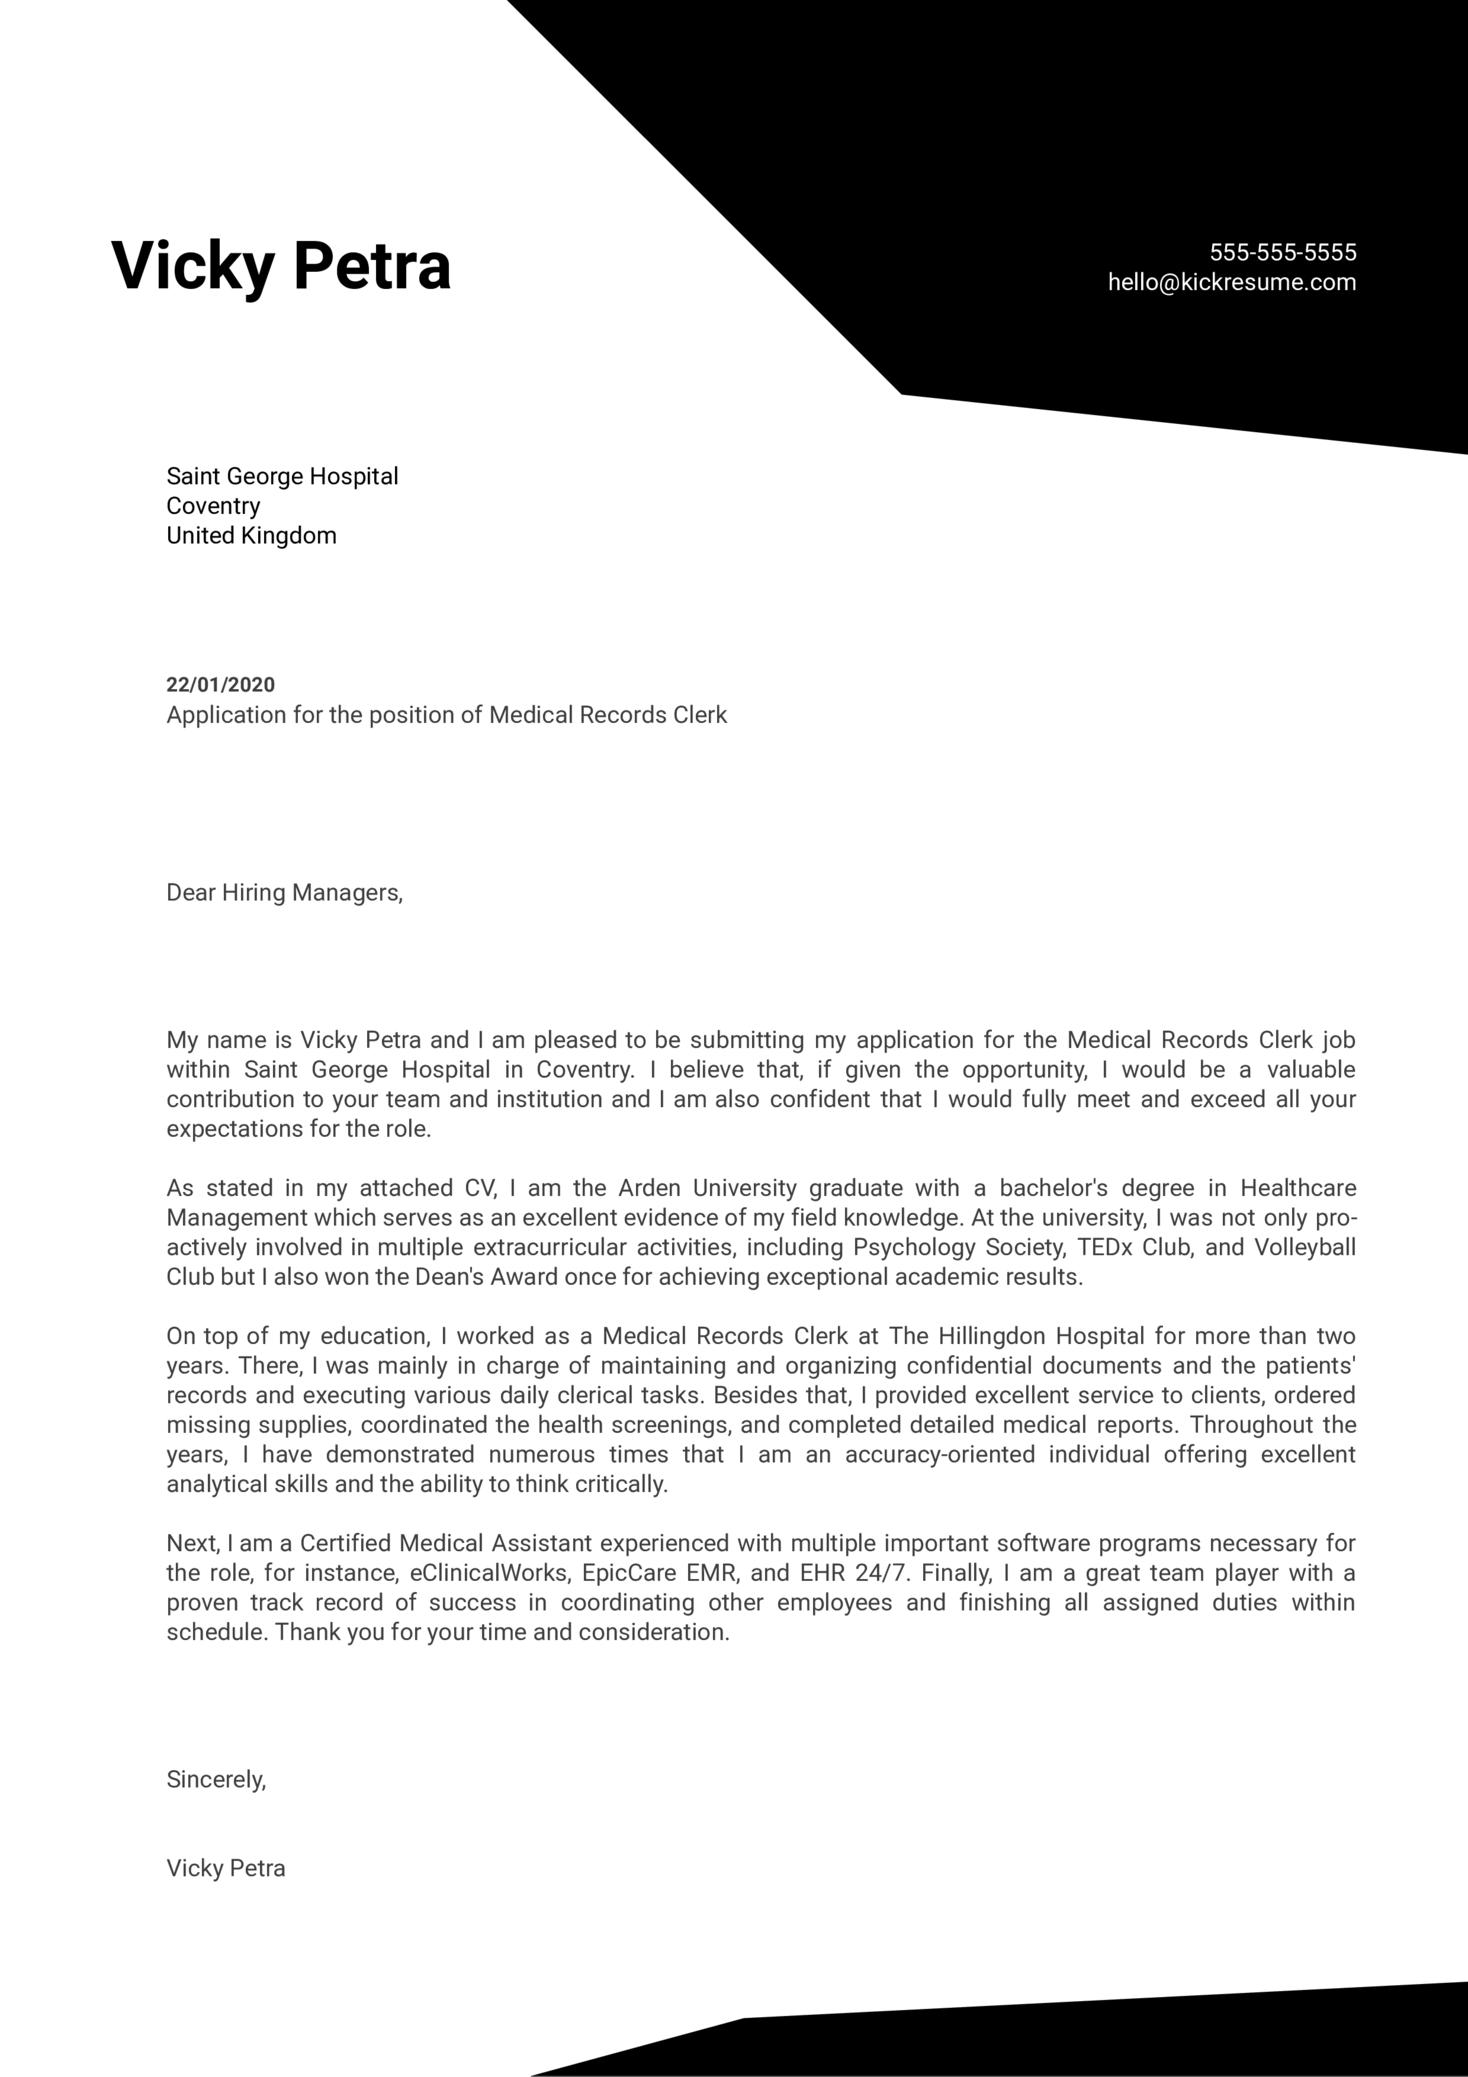 Medical Records Clerk Cover Letter Sample